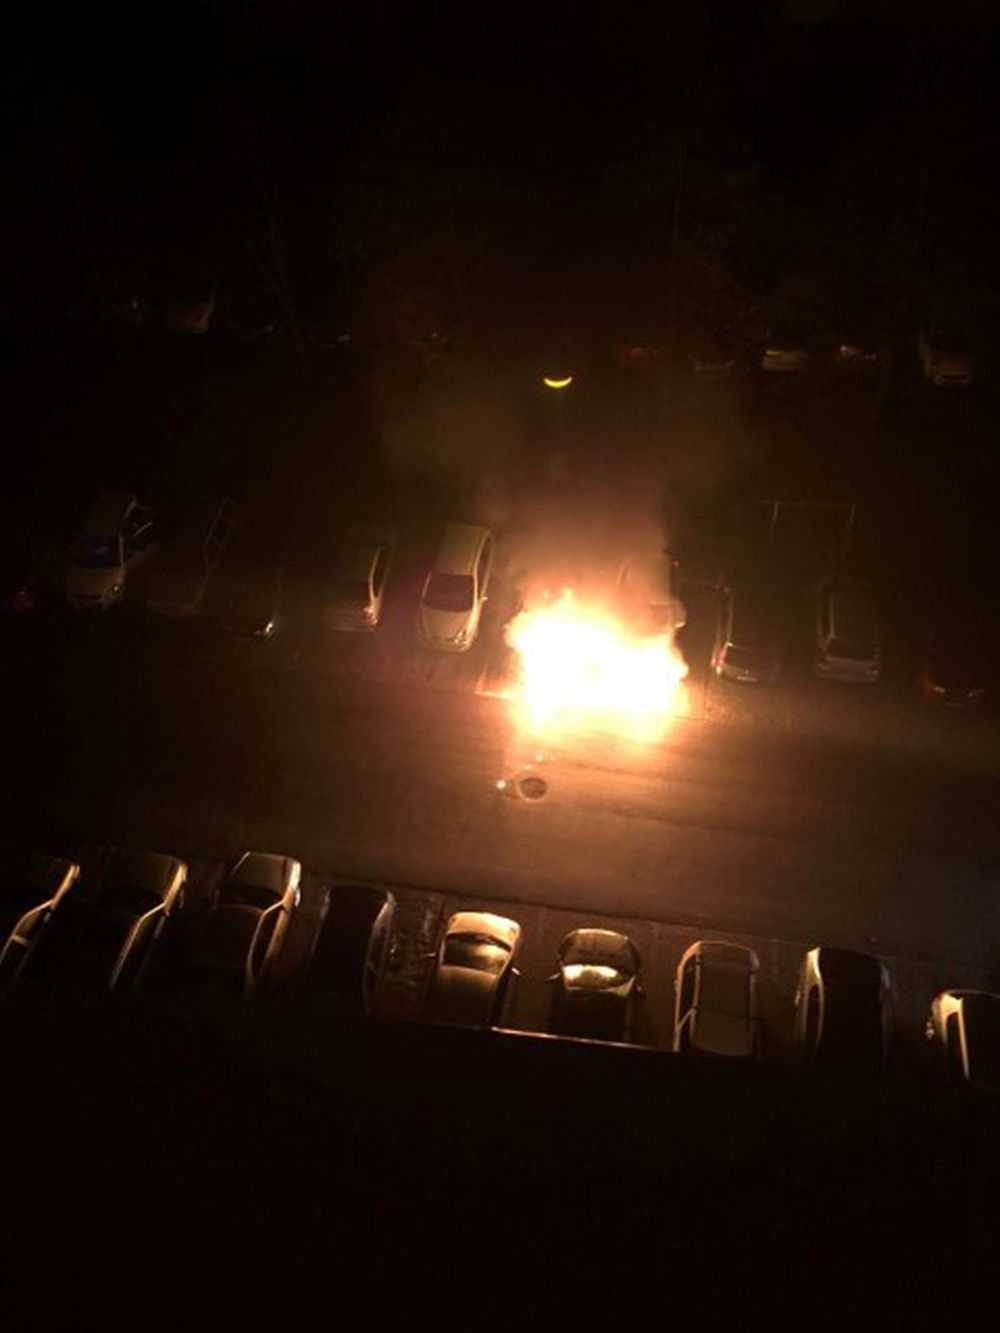 Požiar osobného auta na Hájiku - 28.4.2016 fotografie od majiteľa, foto 11